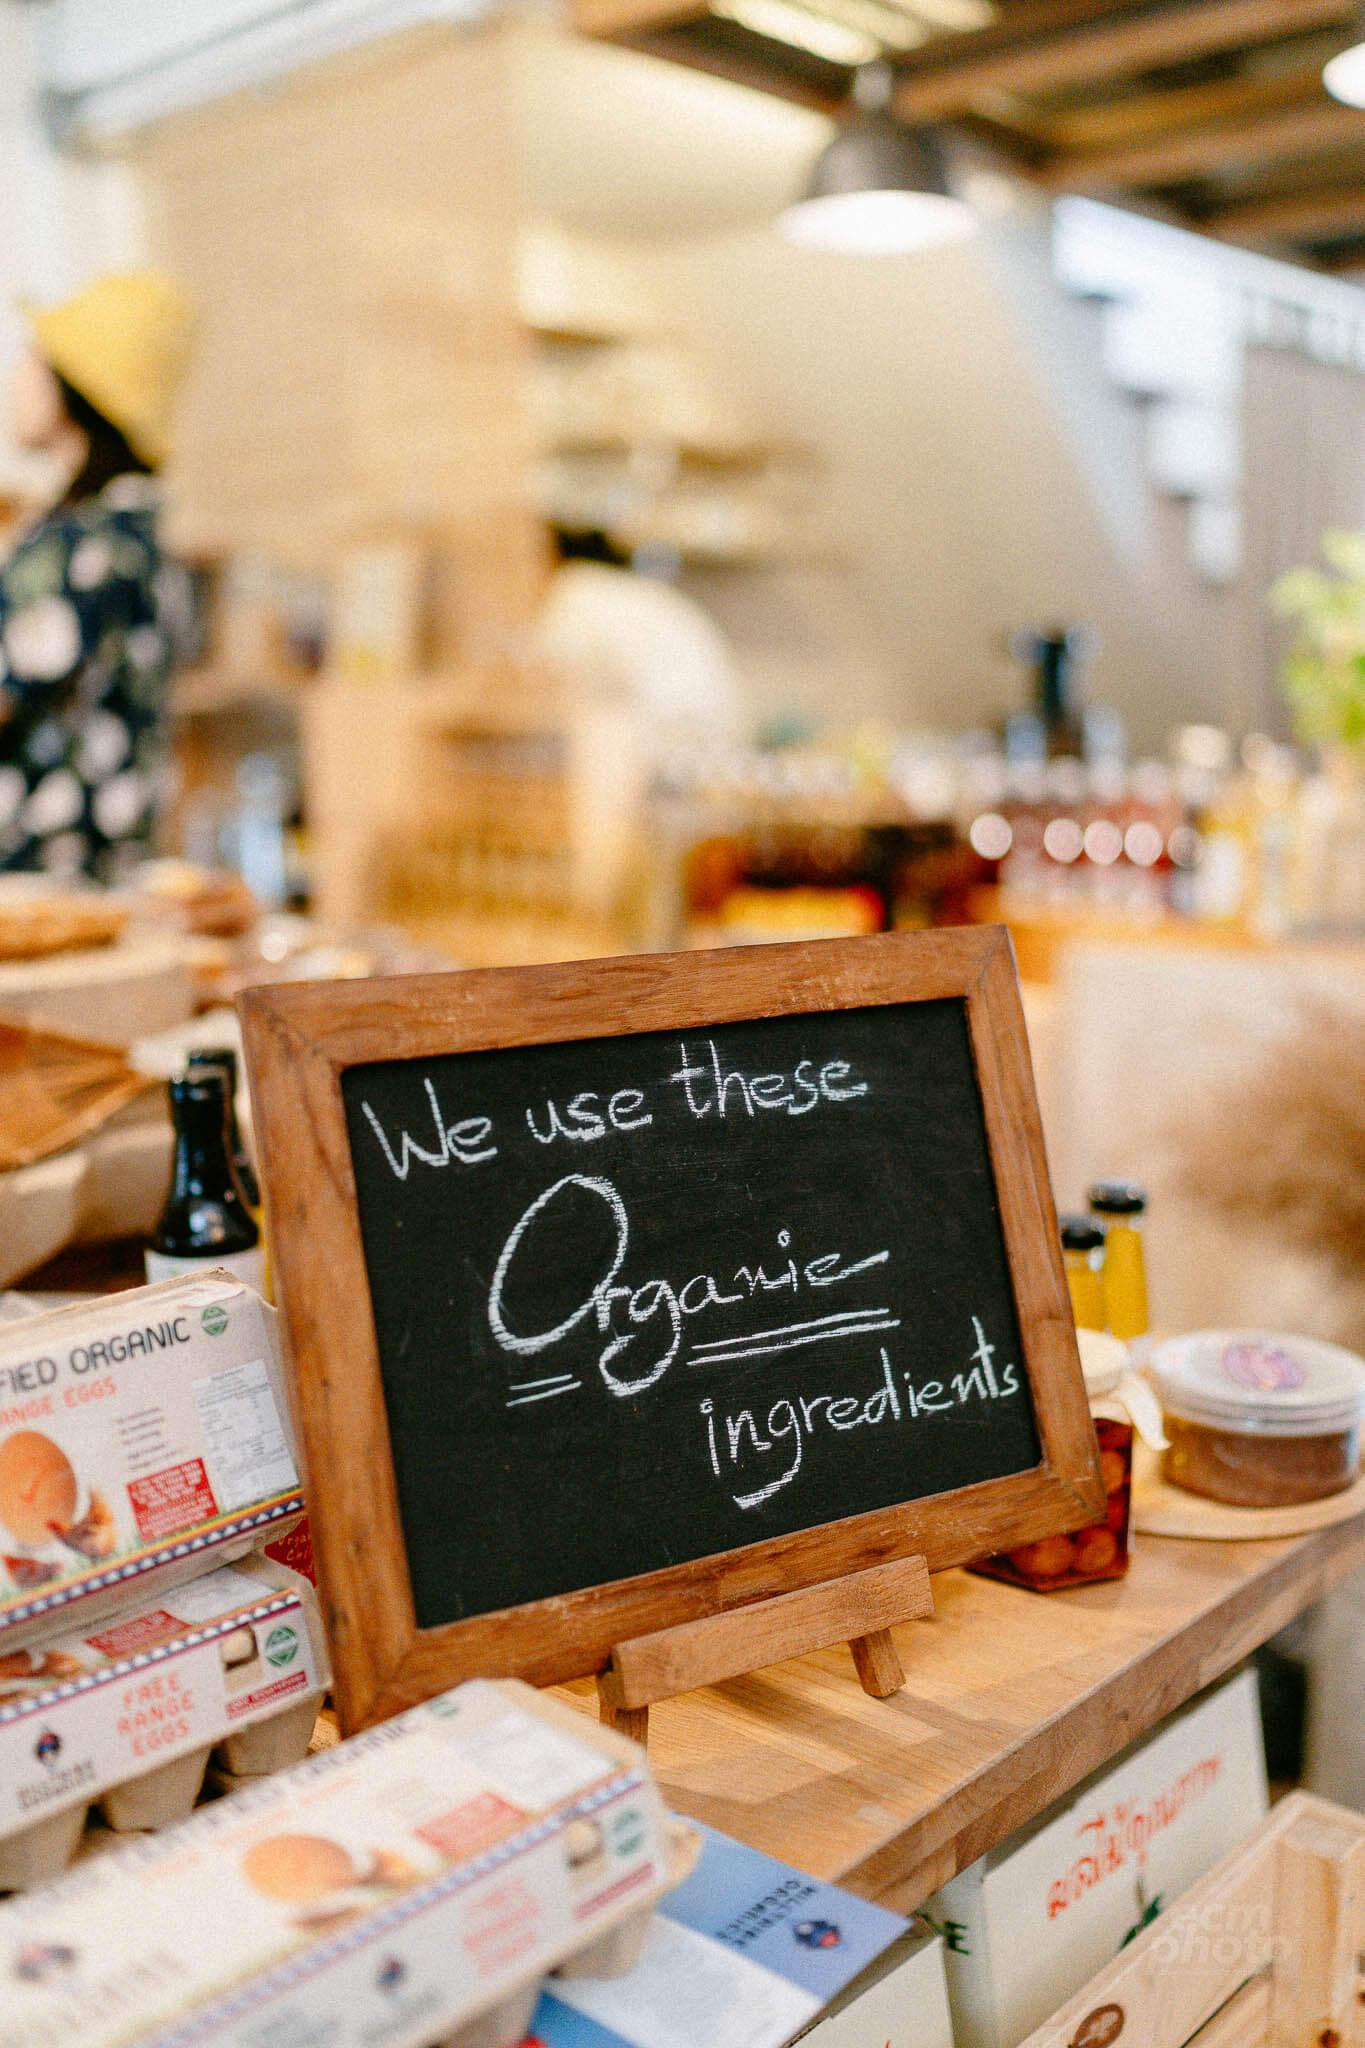 TAAN (ทาน) ORGANIC CAFE คุณทานอิ่มแค่ไหนก็จ่ายตามต้องการ 21 - cafe